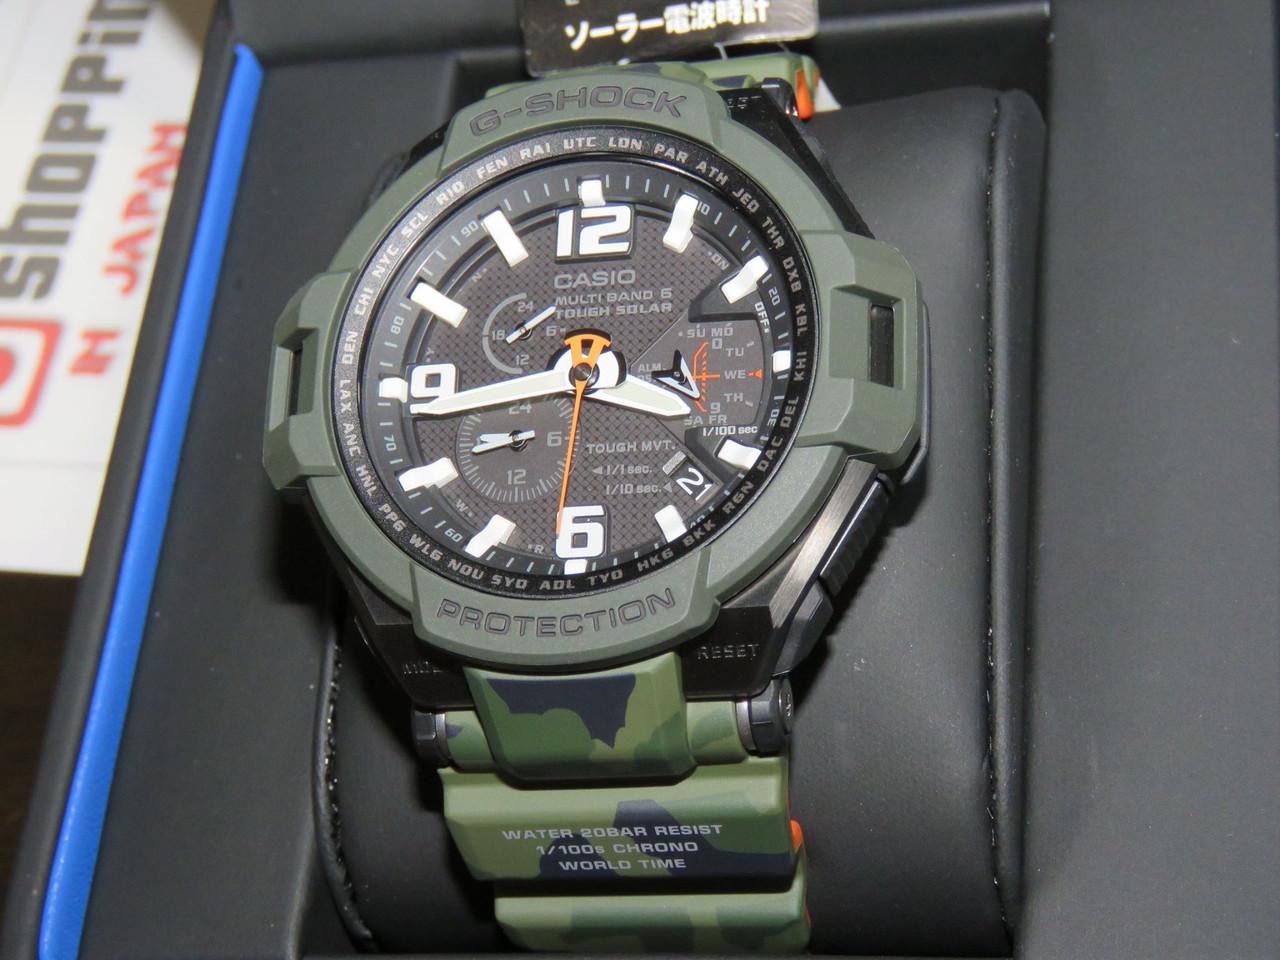 G-Shock GW-4000SC-3AJF Gravitymaster Master Olive Drab